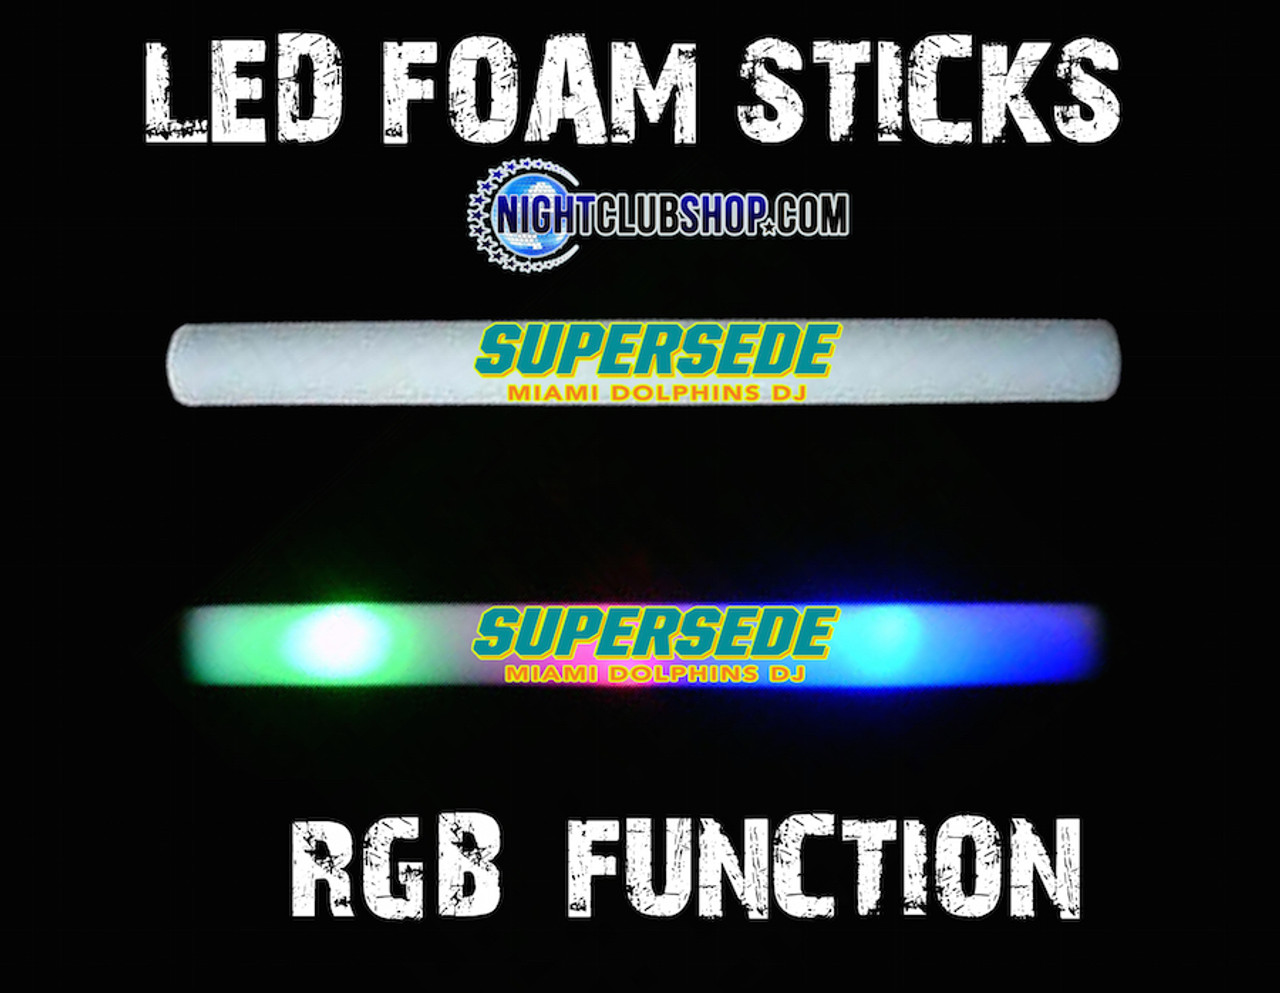 HQ,HD,RGB,LED,Foam,Stick,FoamStick, Glowstick, custom, customized, personalized, logo, art,brand,branded,branding,promo,product, glowstick, baton,lumiton